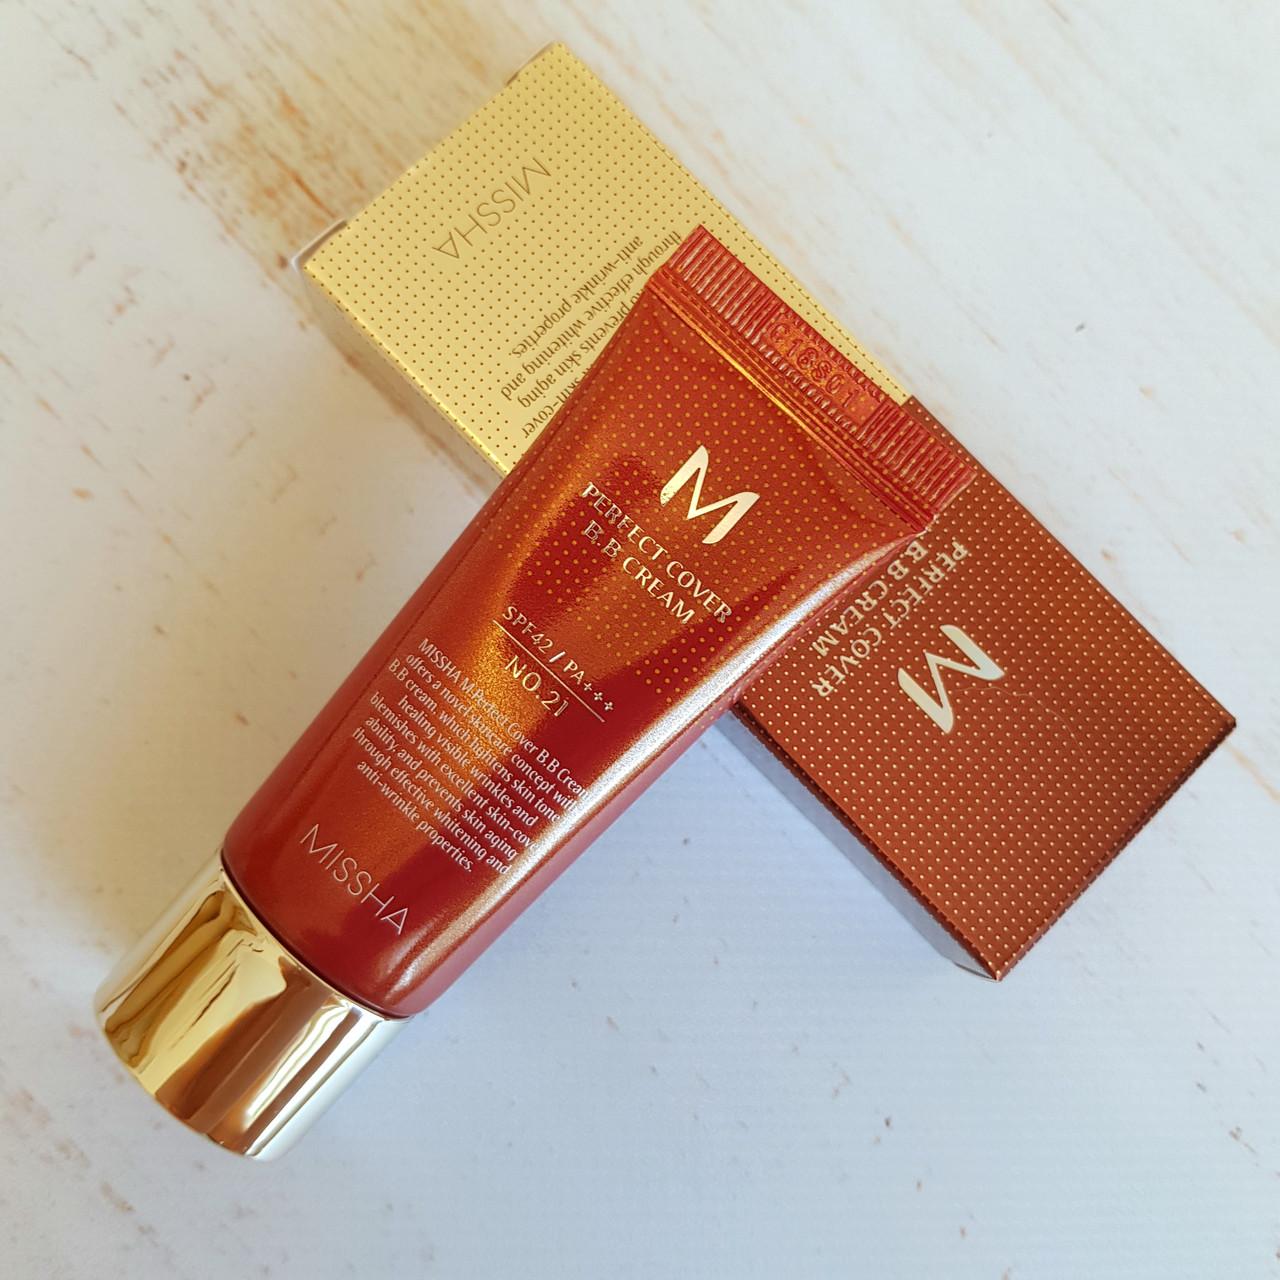 ВВ крем #21 Светлый беж MISSHA M Perfect Cover BB Cream (SPF42/PA+++)  #21 Light Beige 20 мл